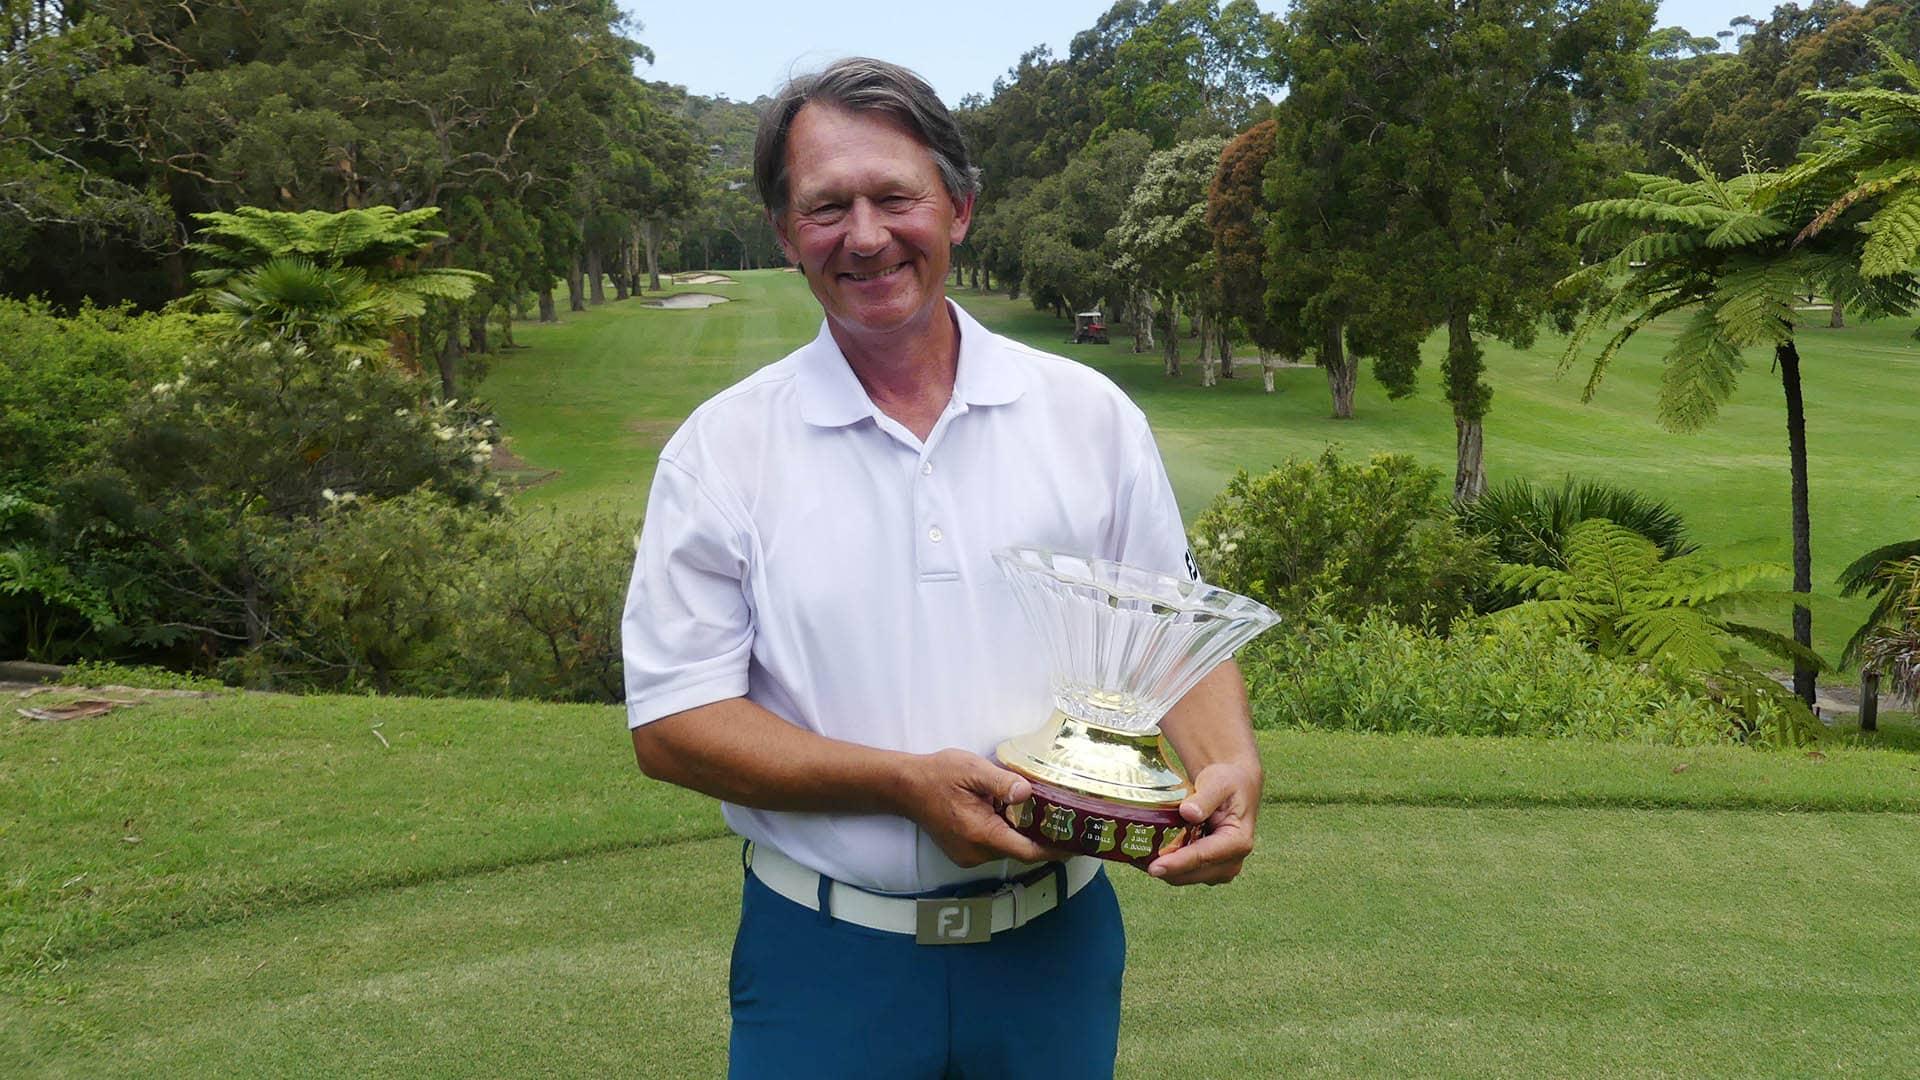 Ken Brewer with the Golf NSW Senior Order of Merit Trophy